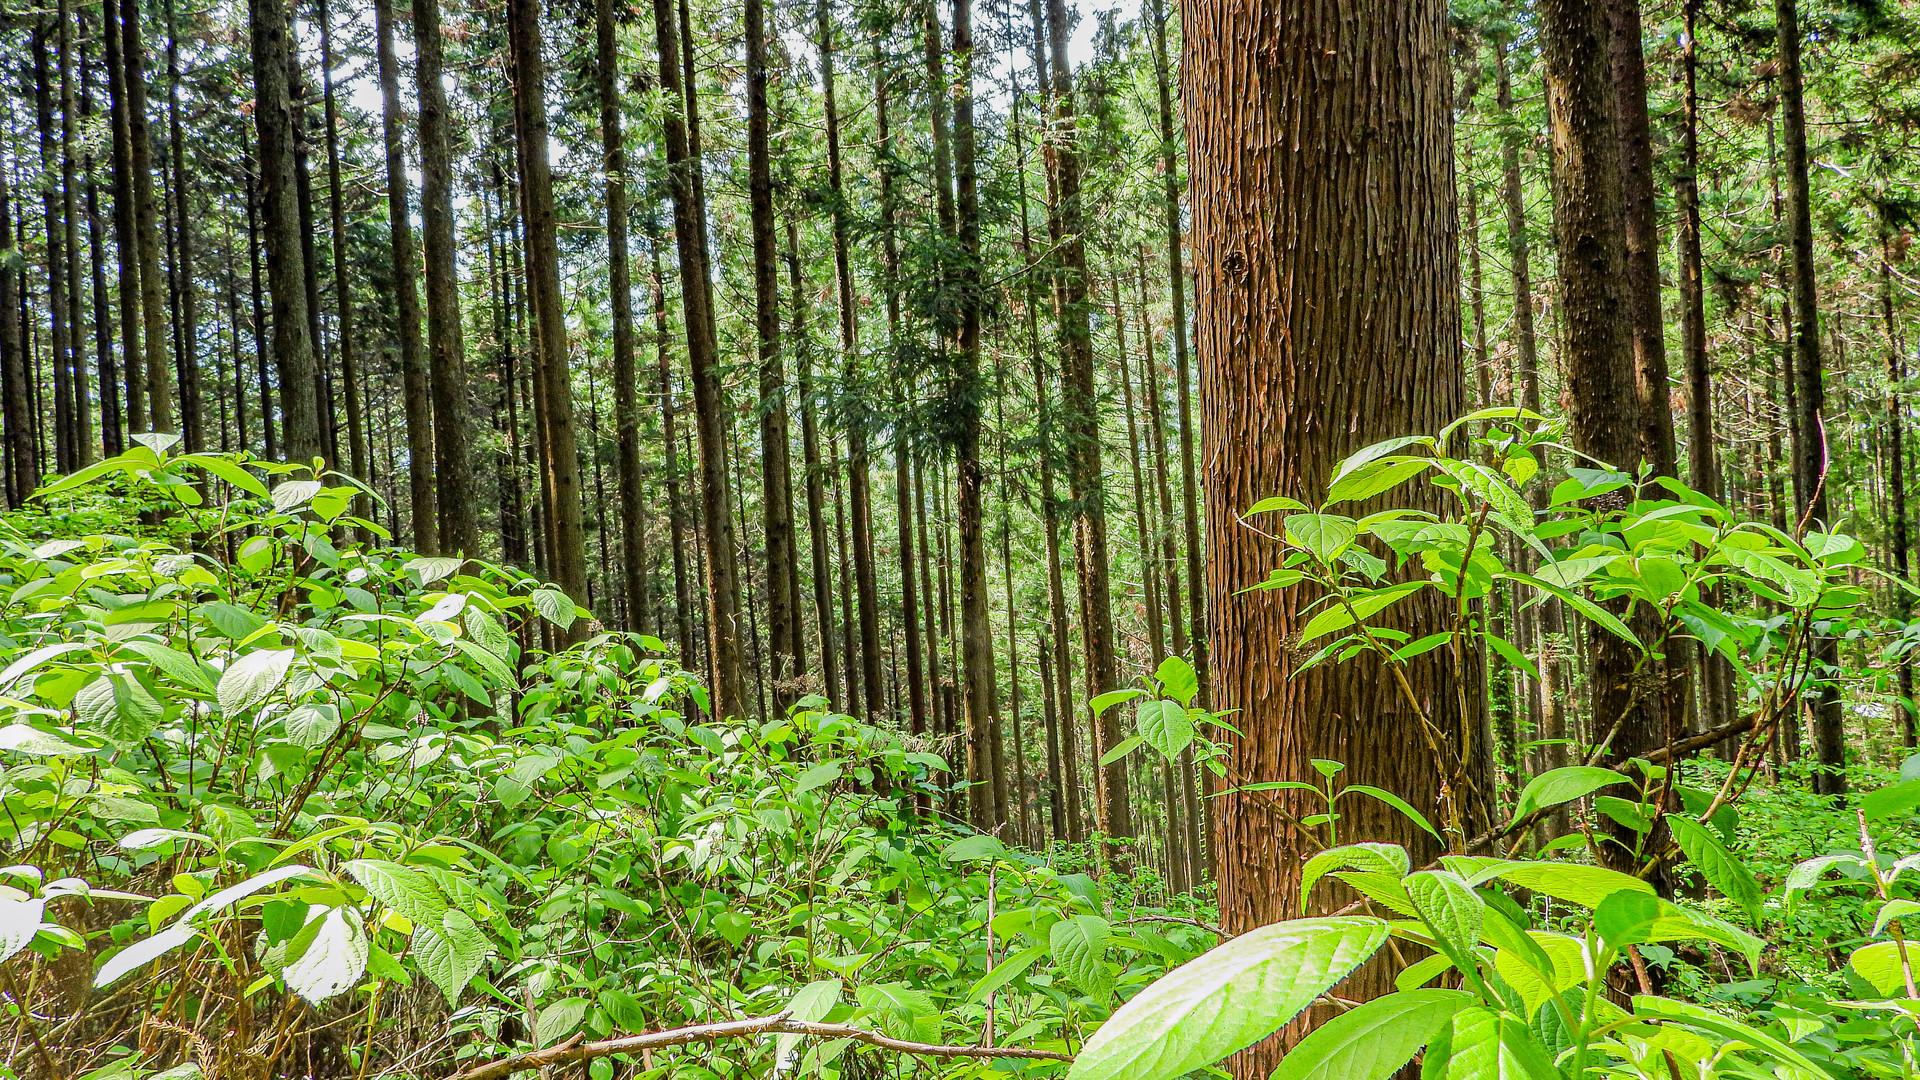 Uenomura Forest, Japan